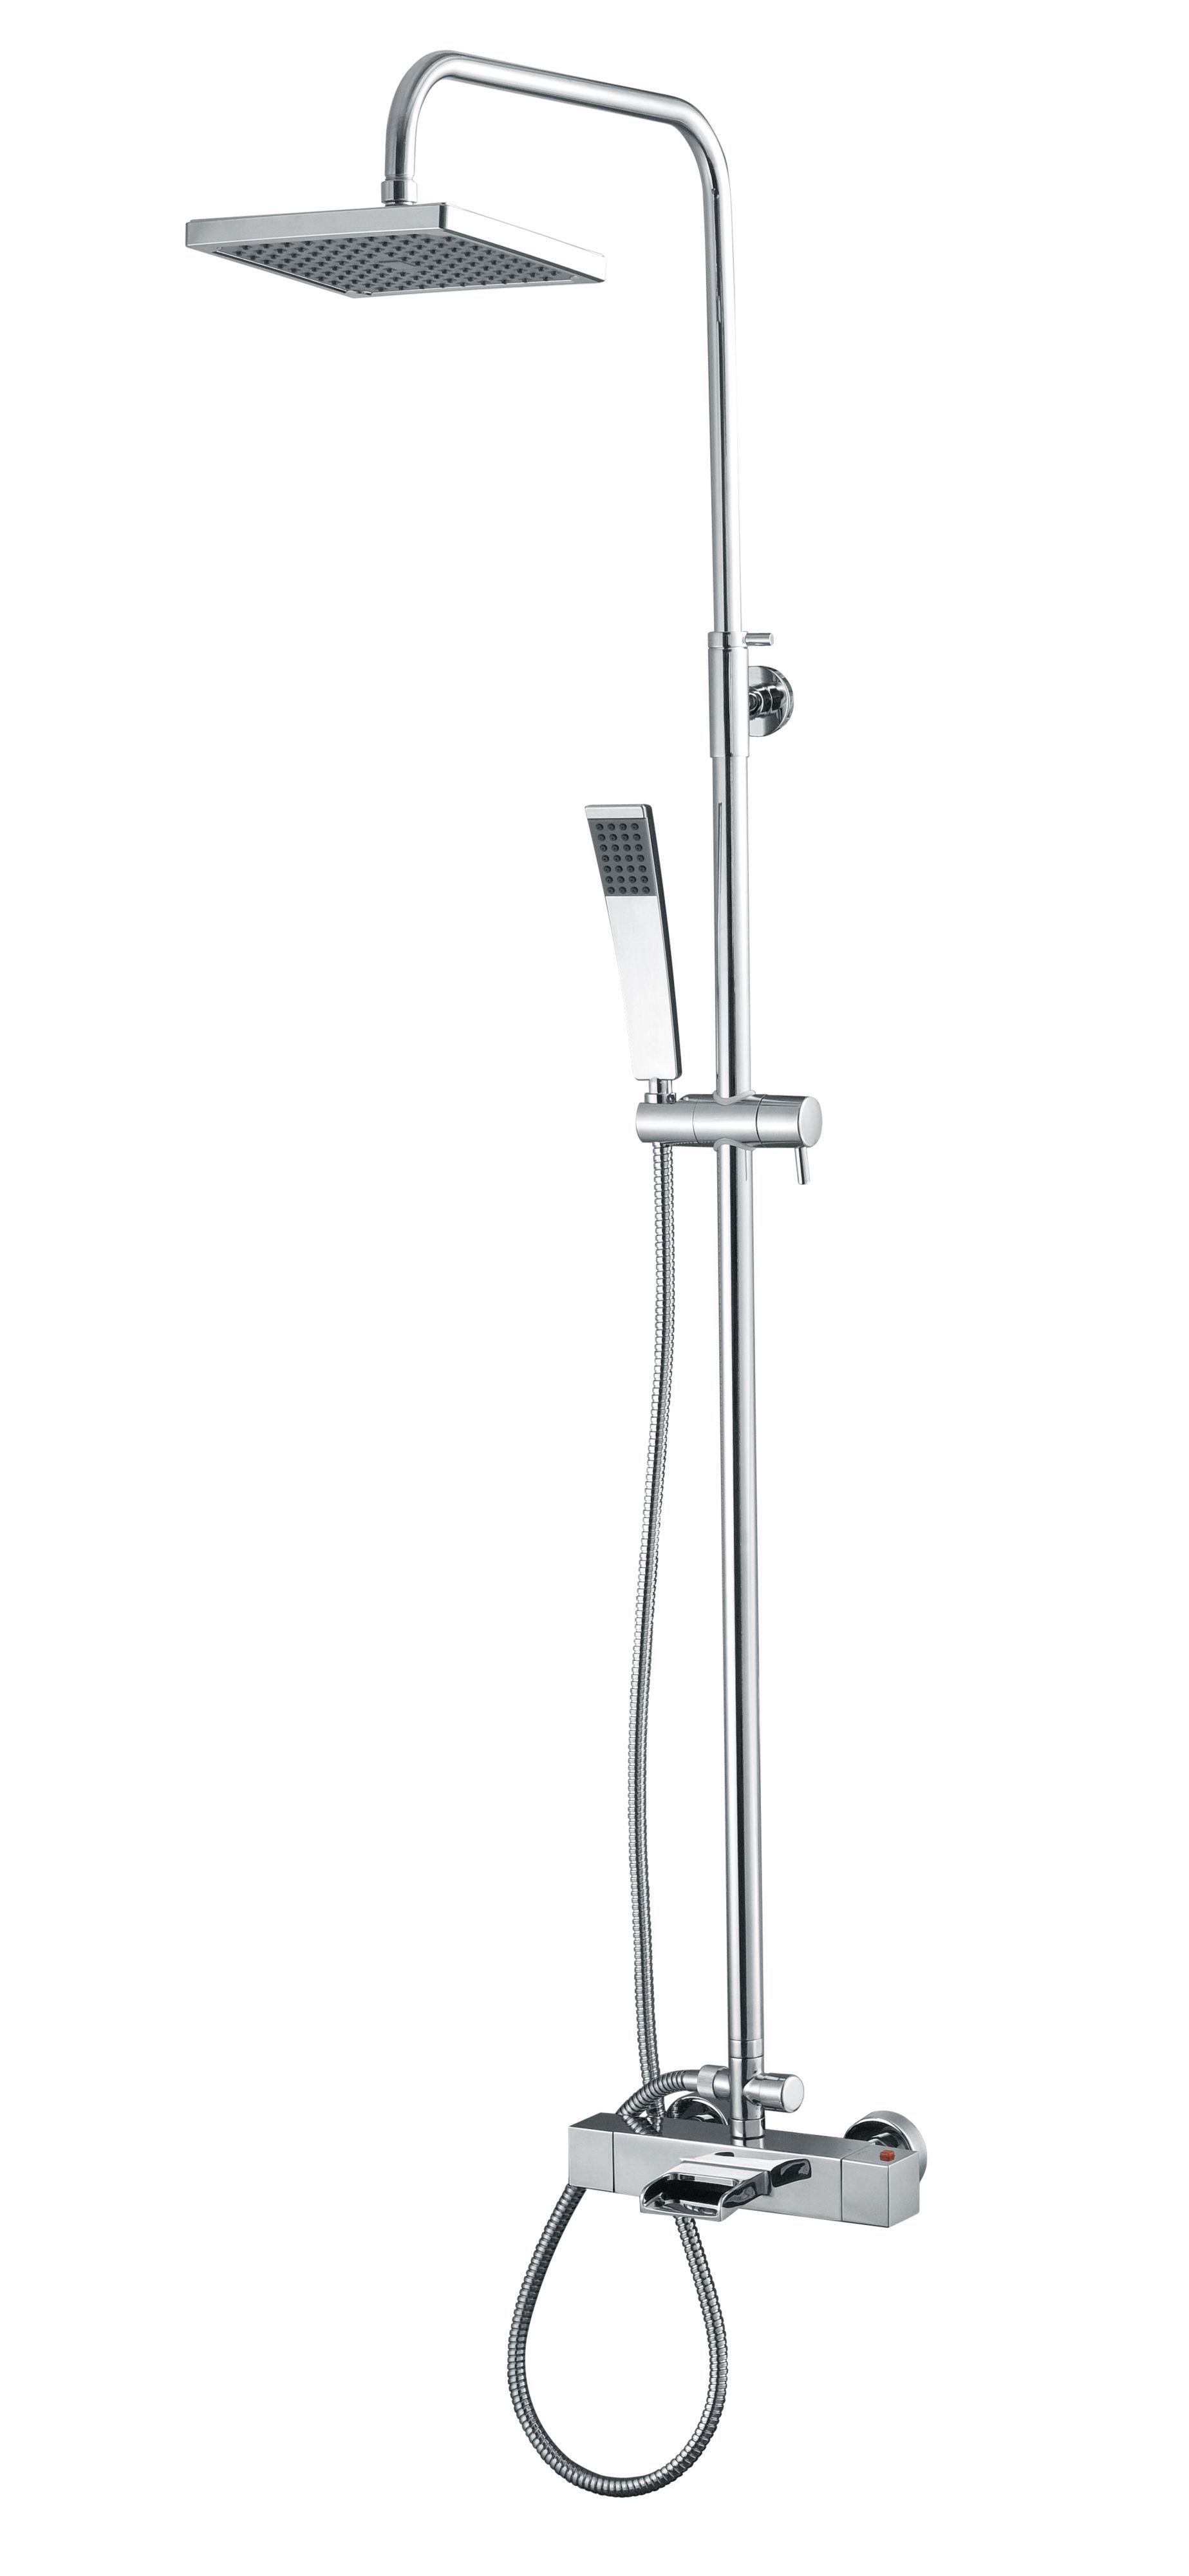 Cooke & Lewis Havasu Chrome Thermostatic Bath Filler Mixer Shower ...